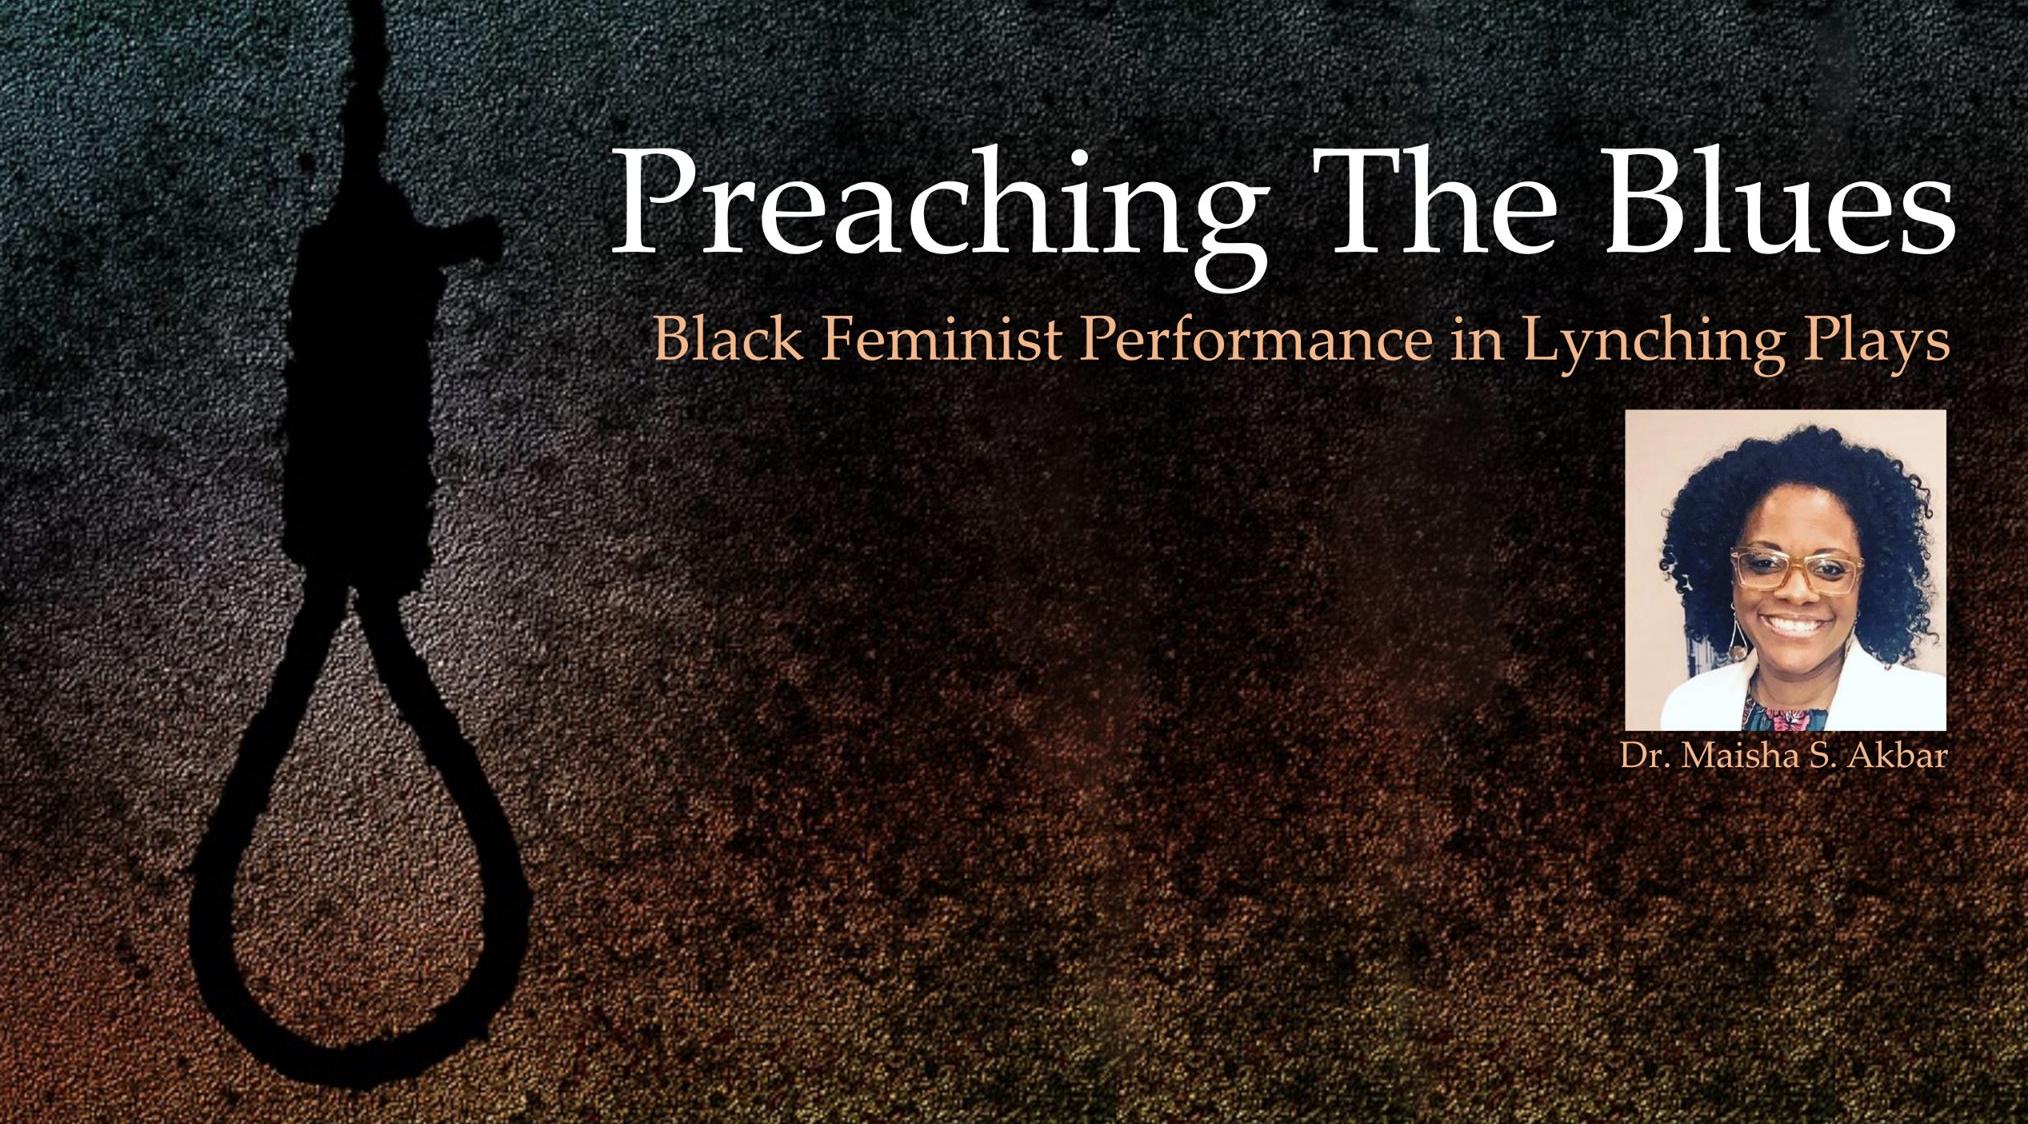 Preaching the Blues Black Feminist Performance in Lynching Plays